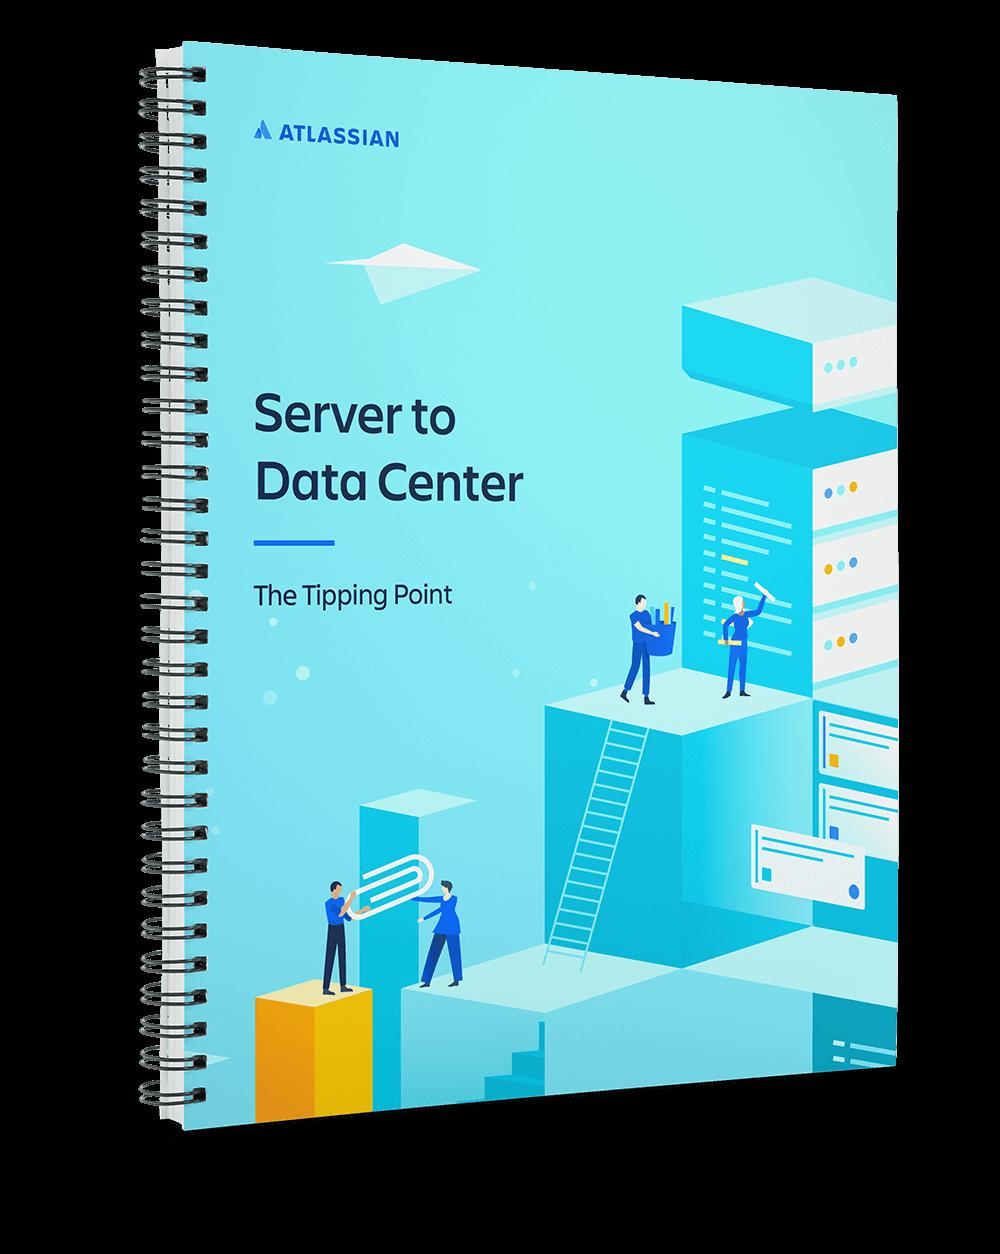 Bitbucket - Data Center | Atlassian